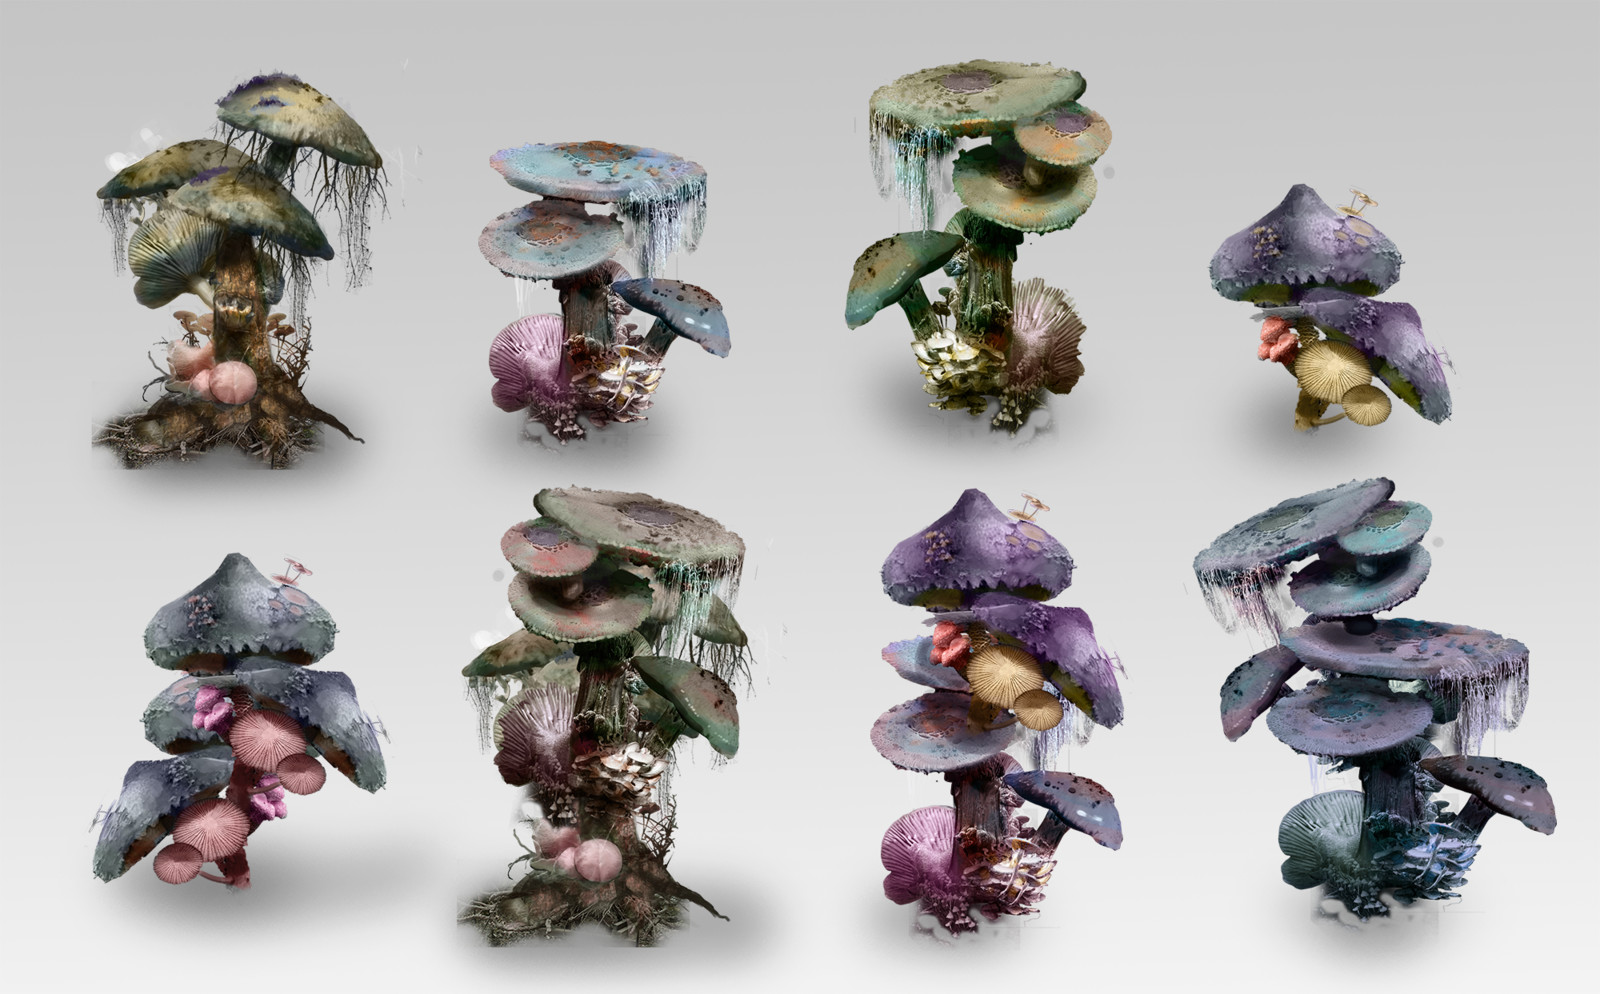 Alien Mushroom Tree Concepts